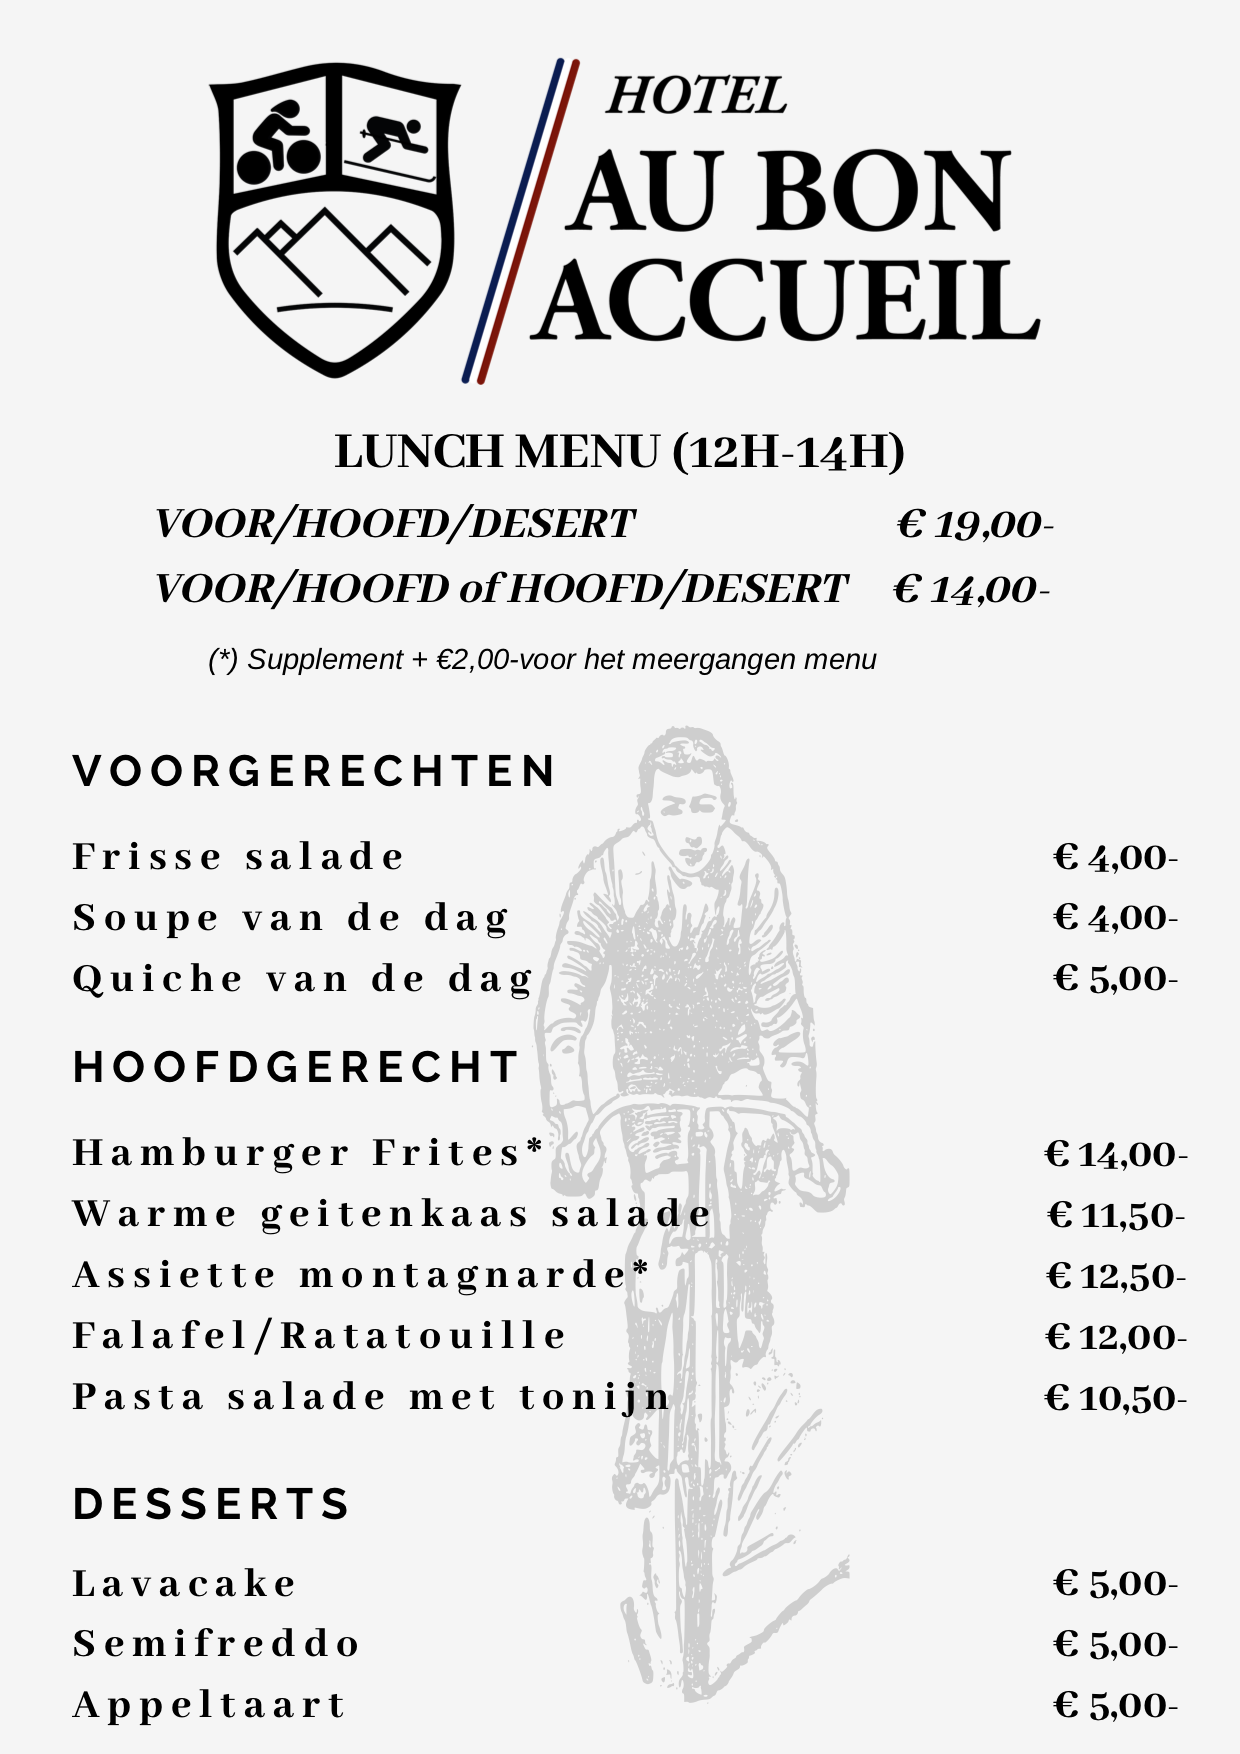 Notre menu a dejeuner, a partir de 12:00 jusqu'au 14:00